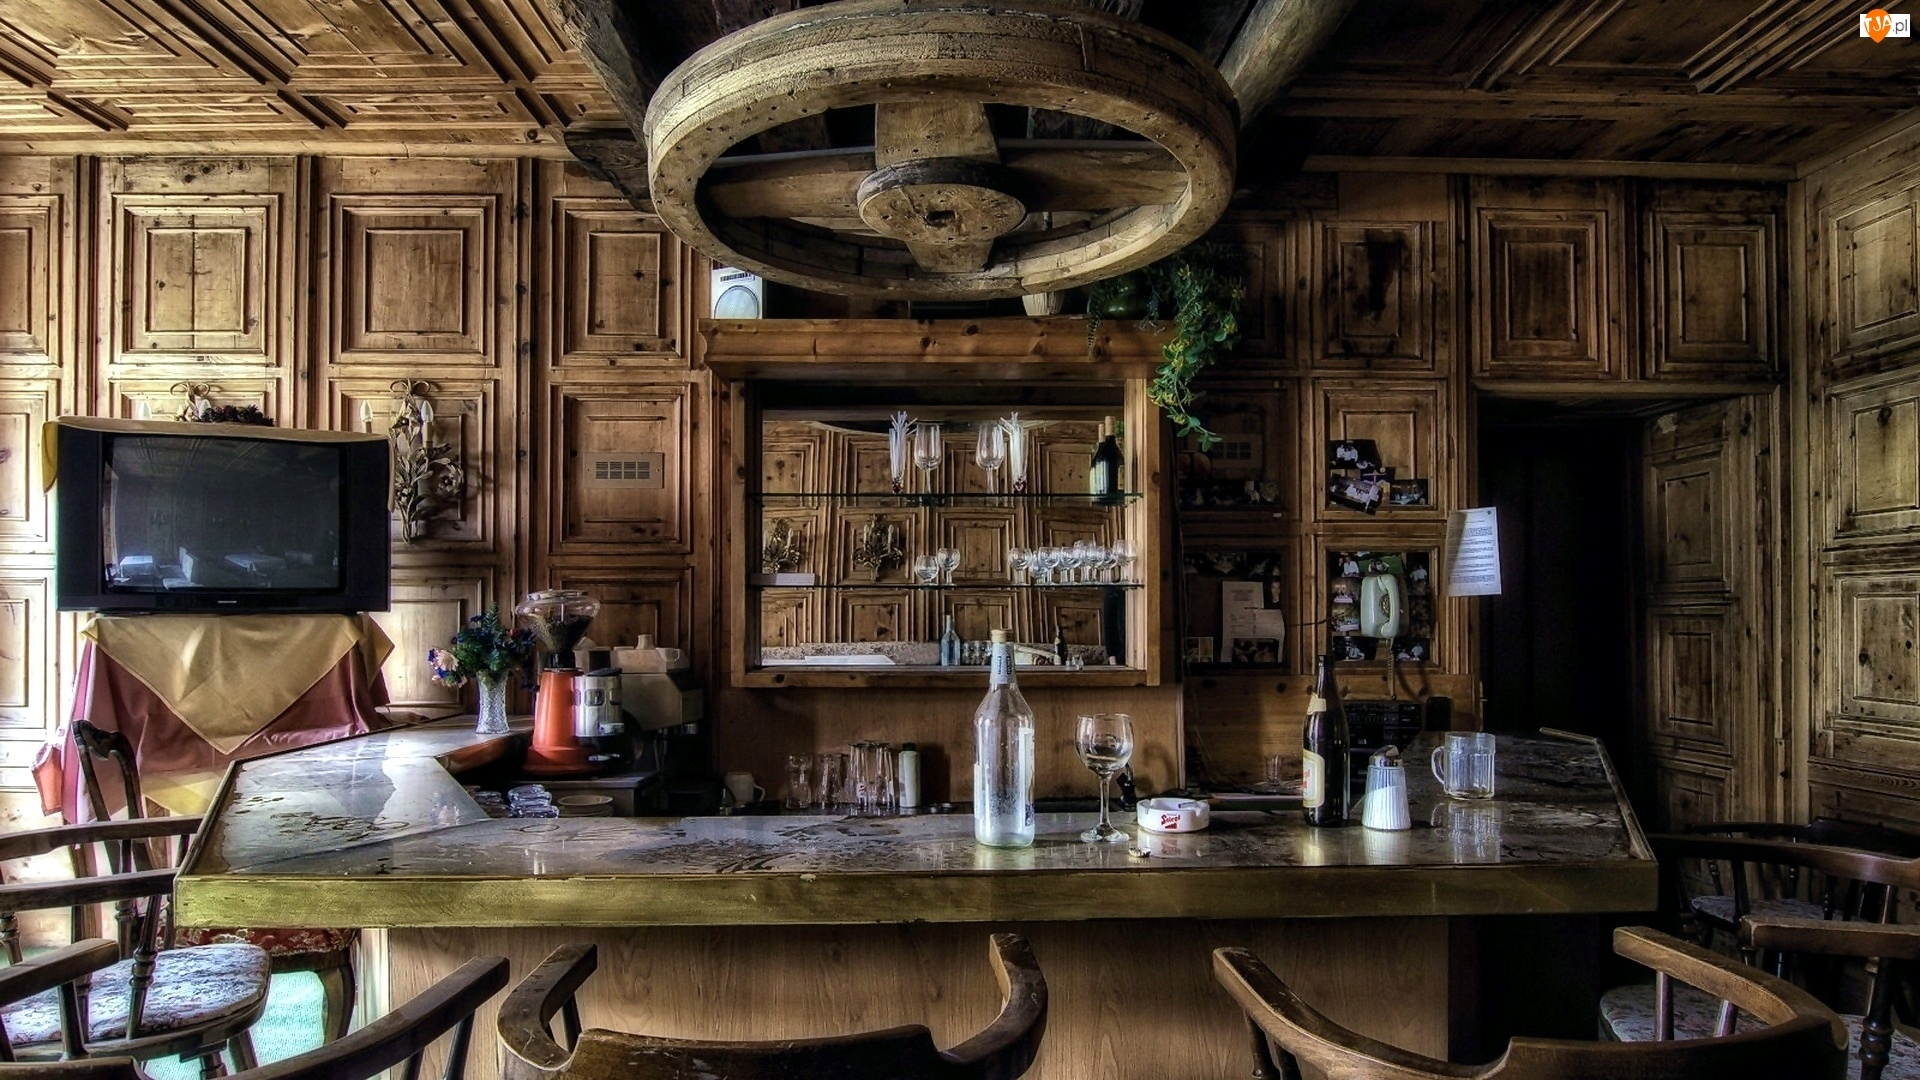 Barek, Wnętrze, Bar